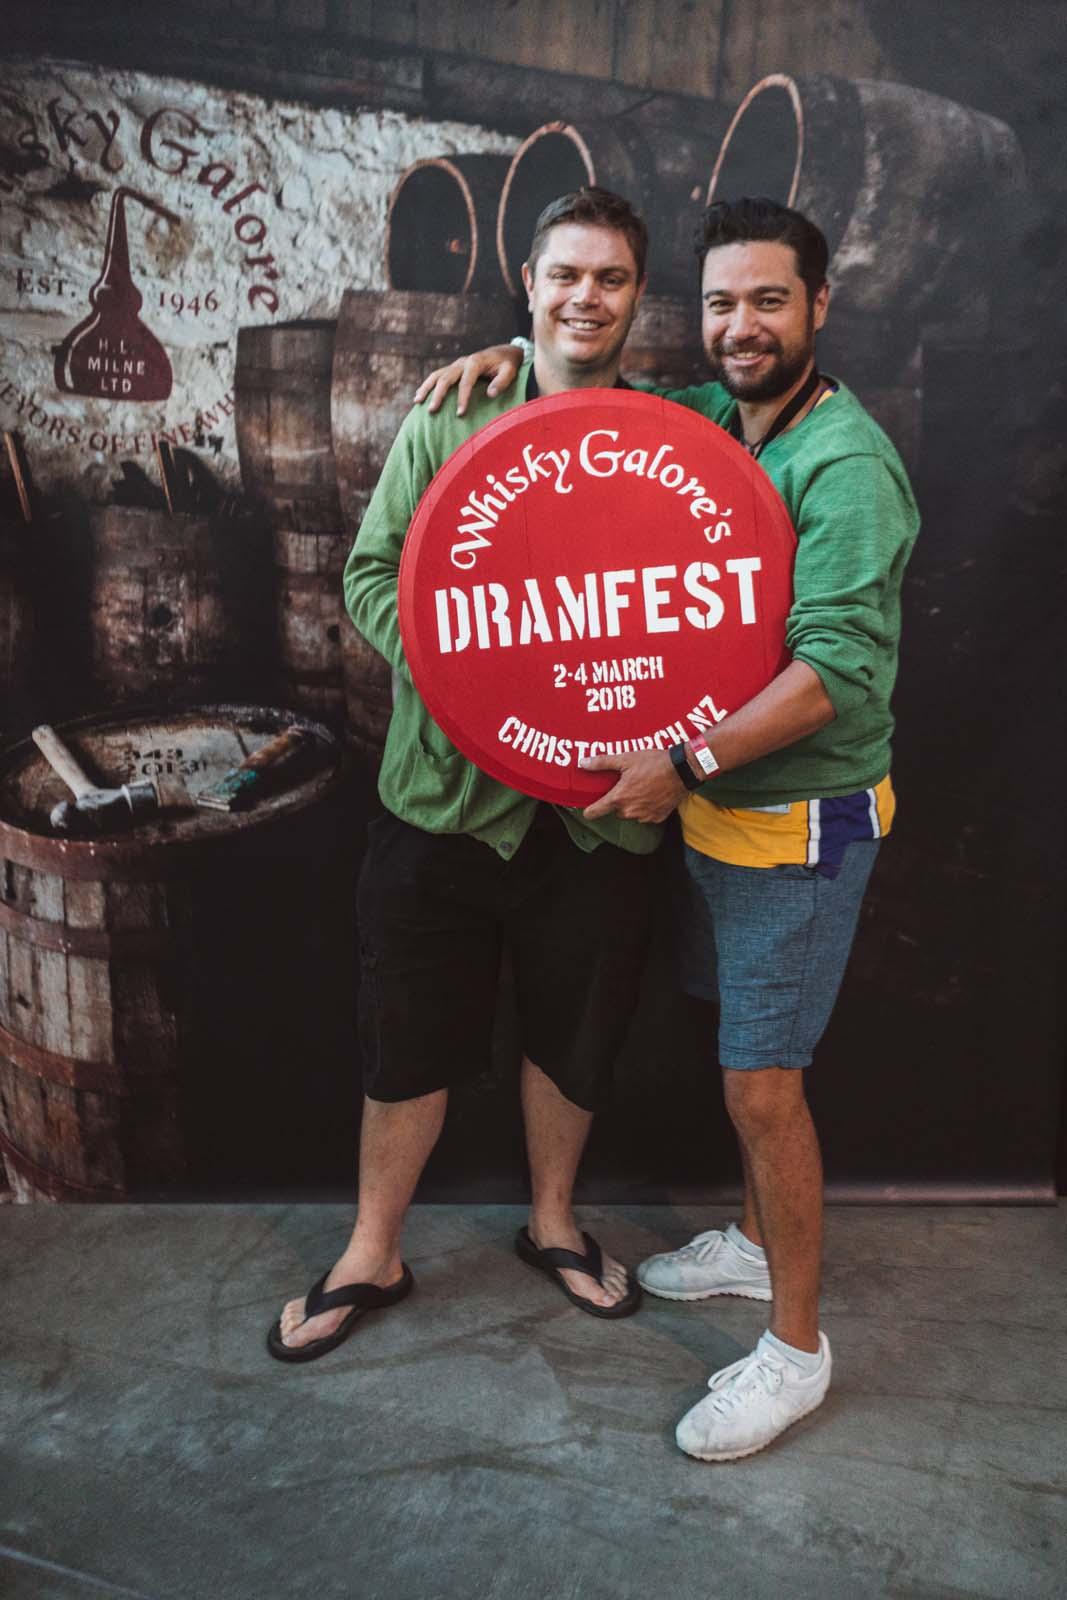 Dramfest 2018 for Whisky Galore-157.jpg